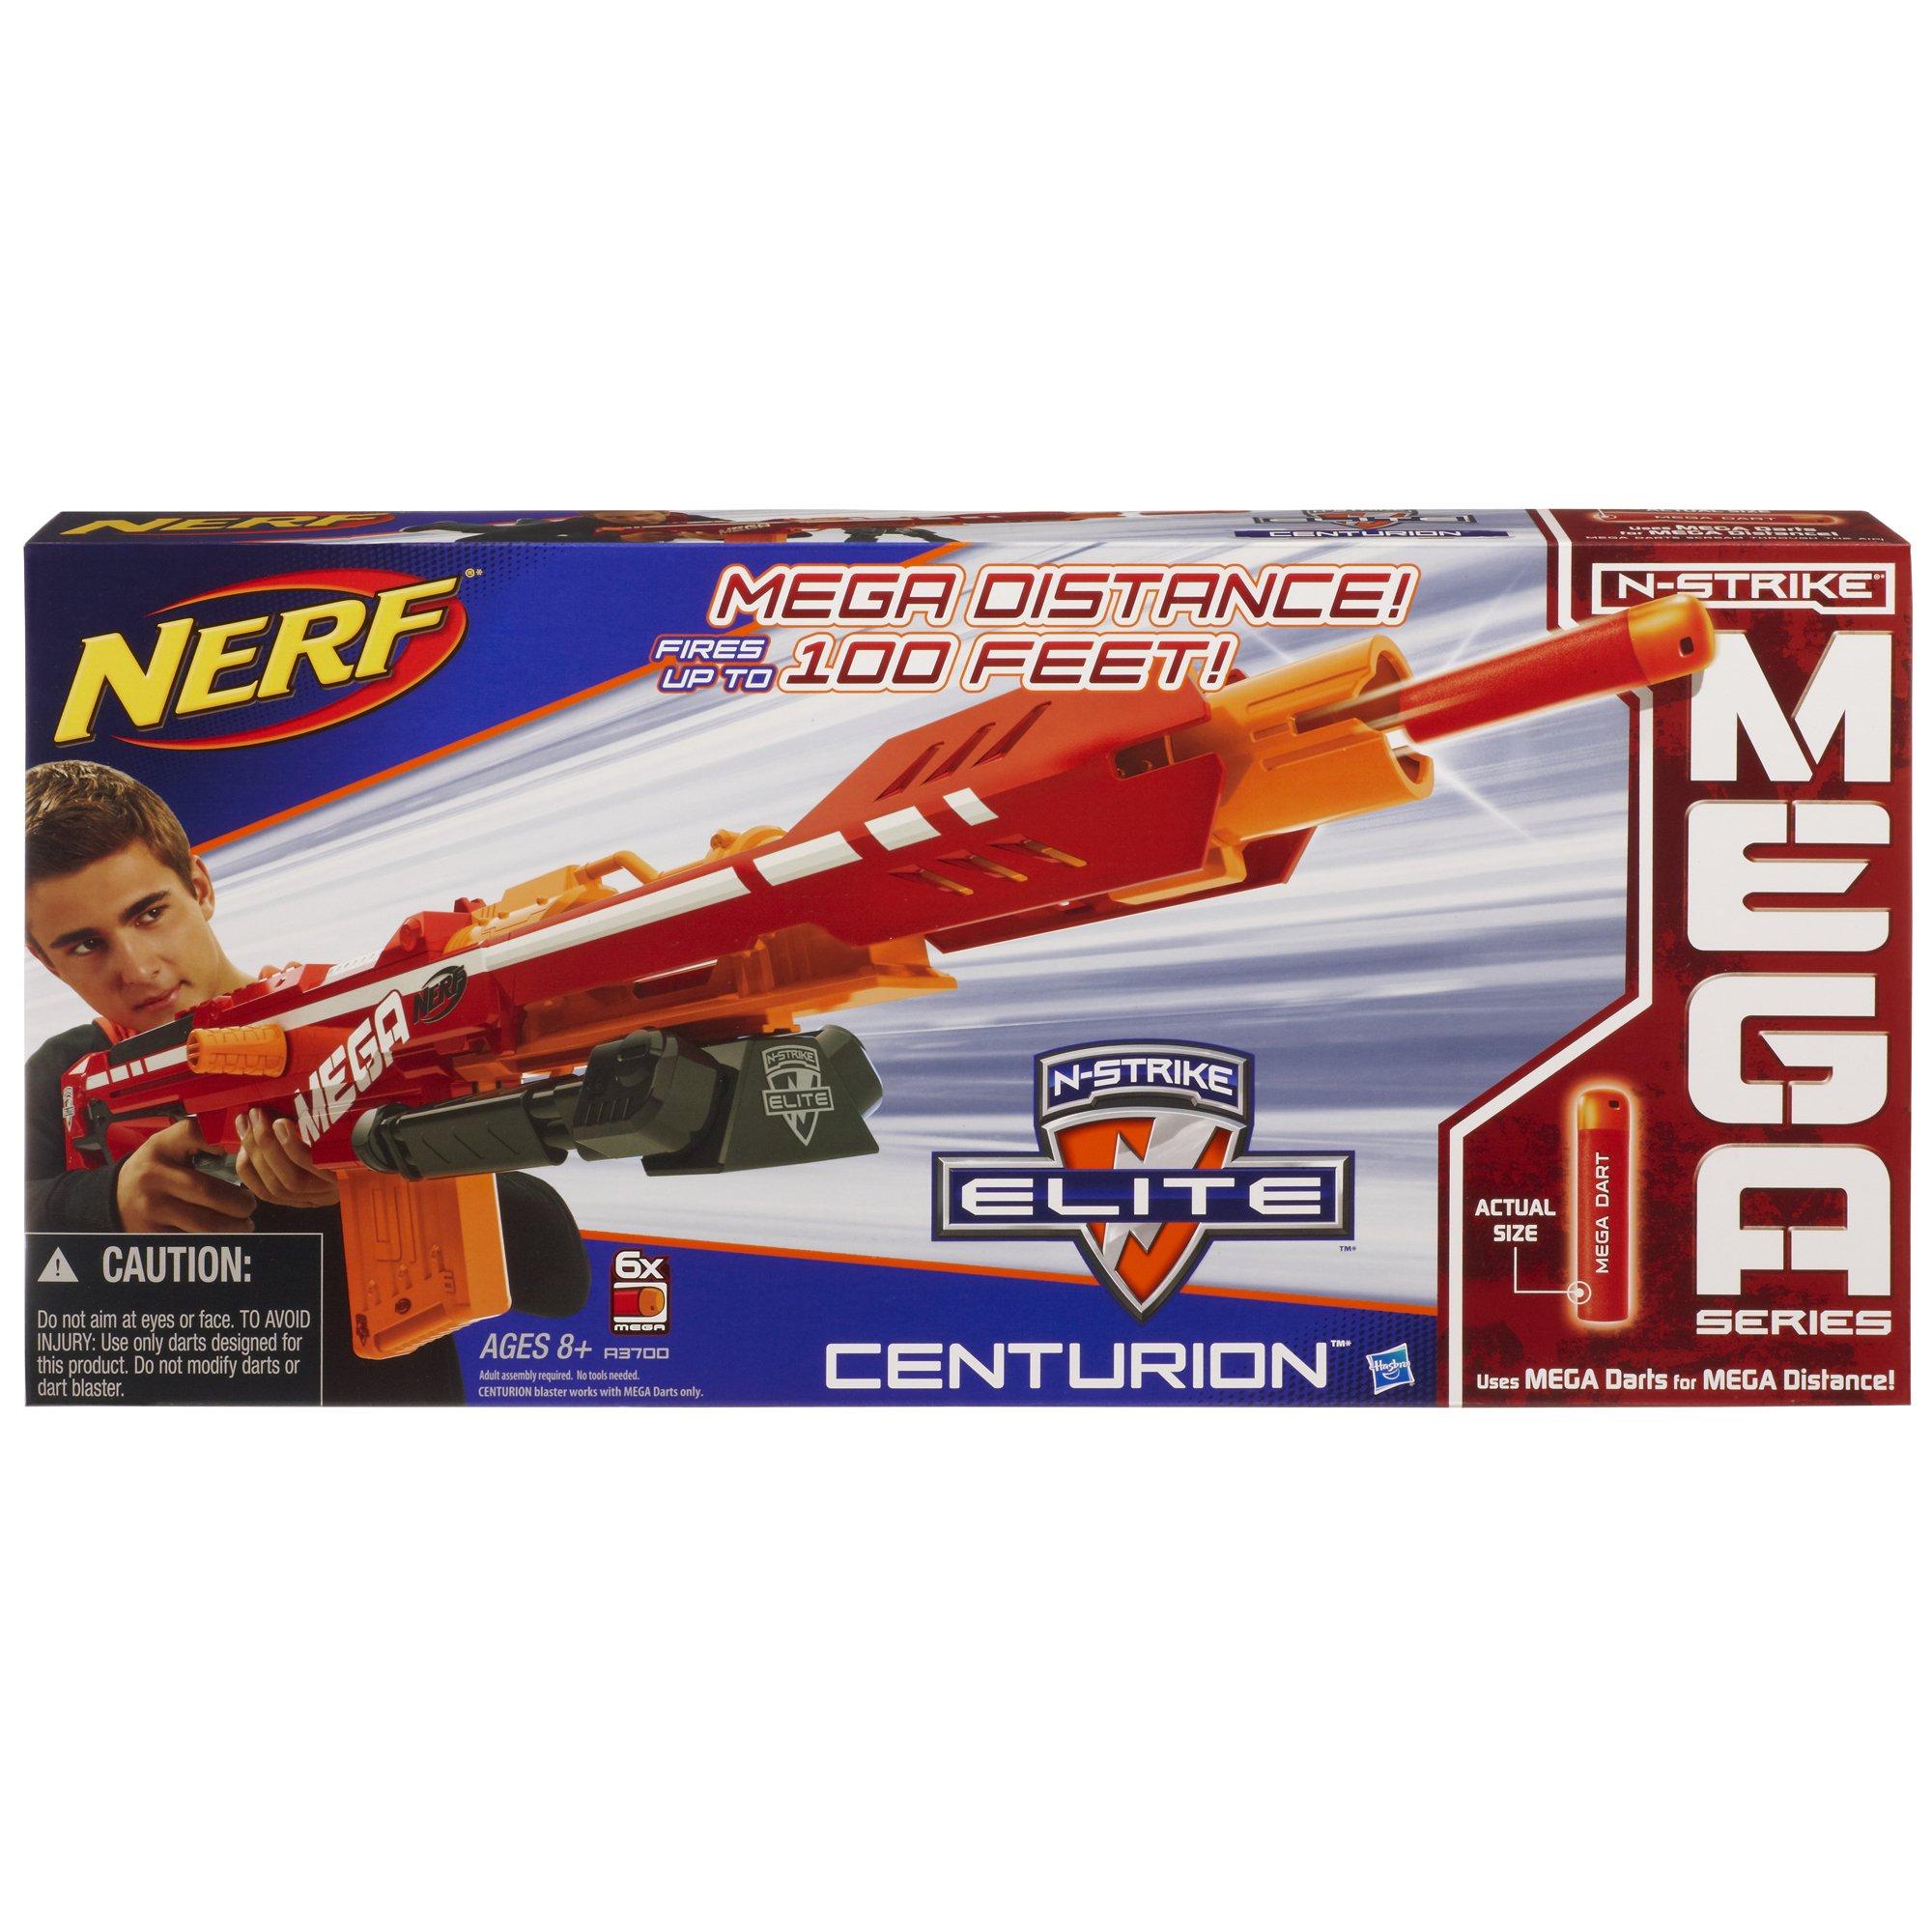 Nerf N-Strike Elite Centurion Blaster by NERF (Image #2)